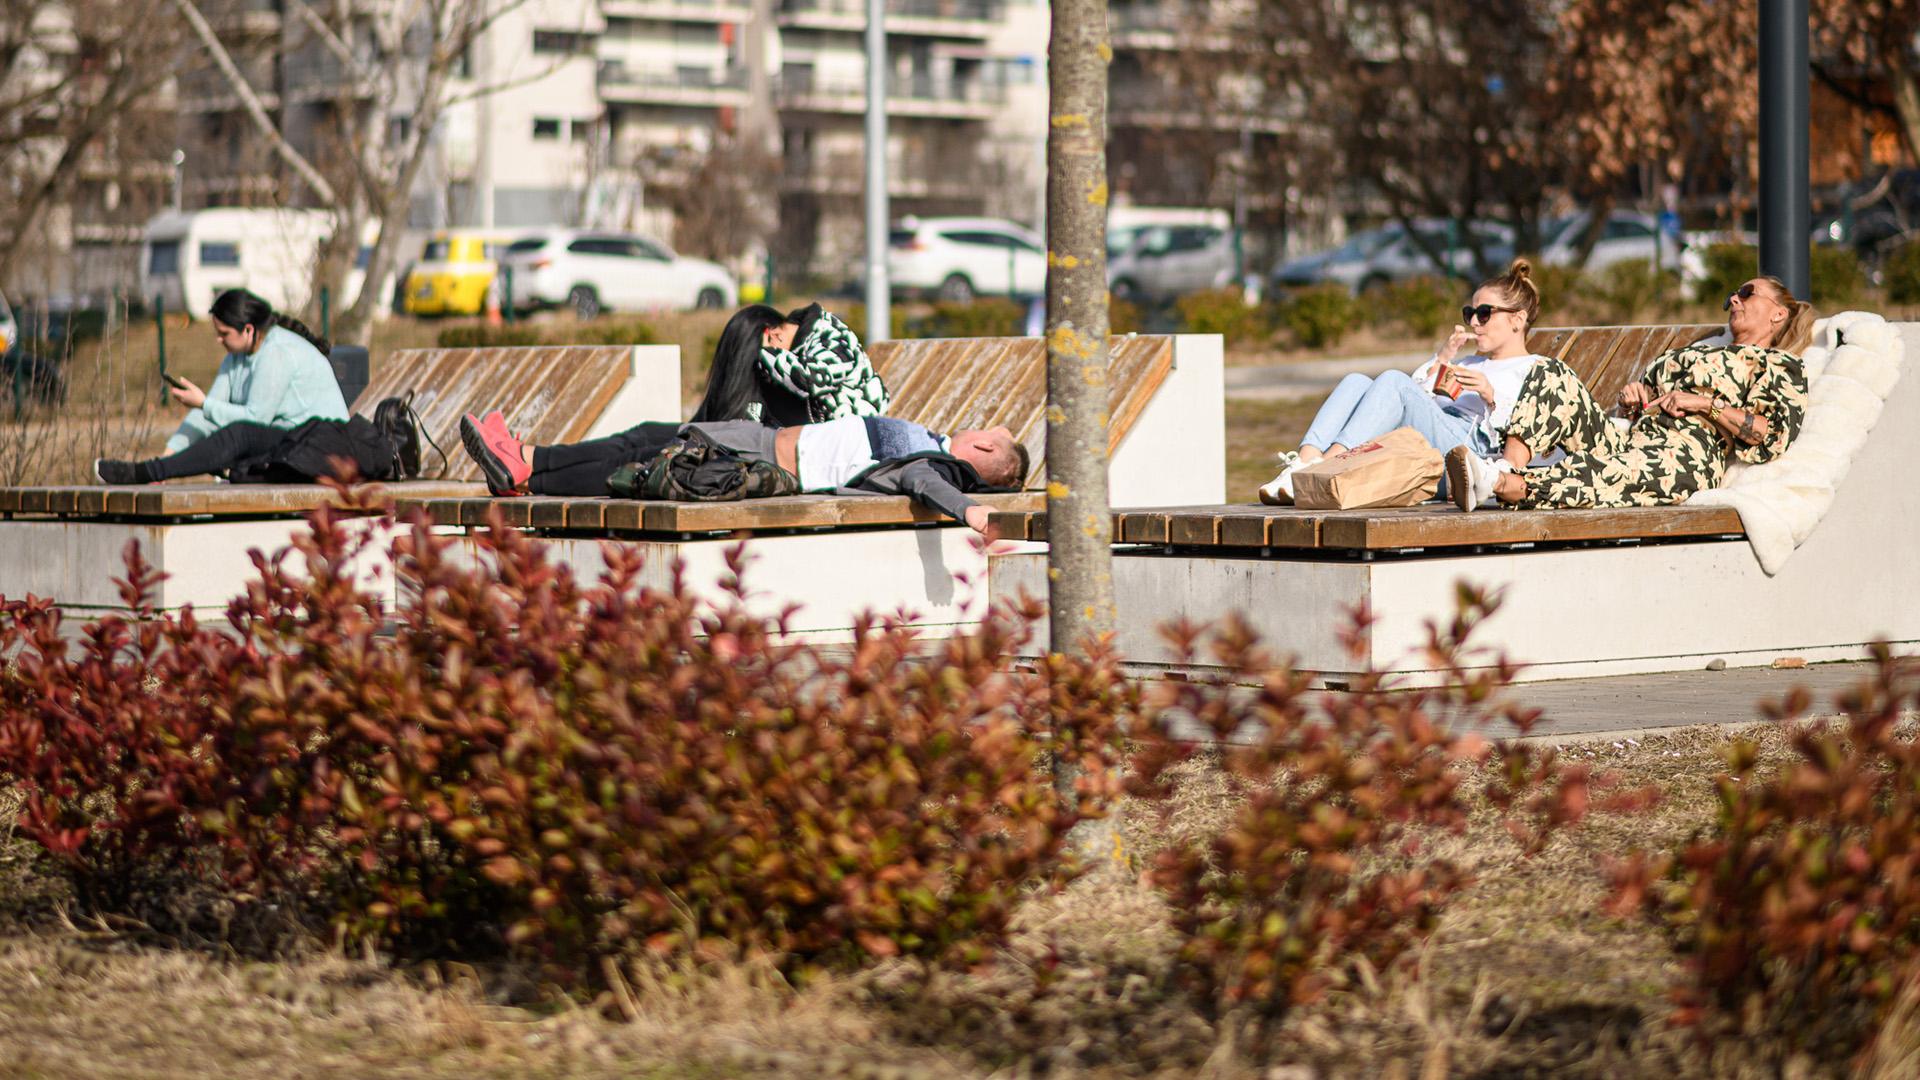 Februári tavasz Budapesten